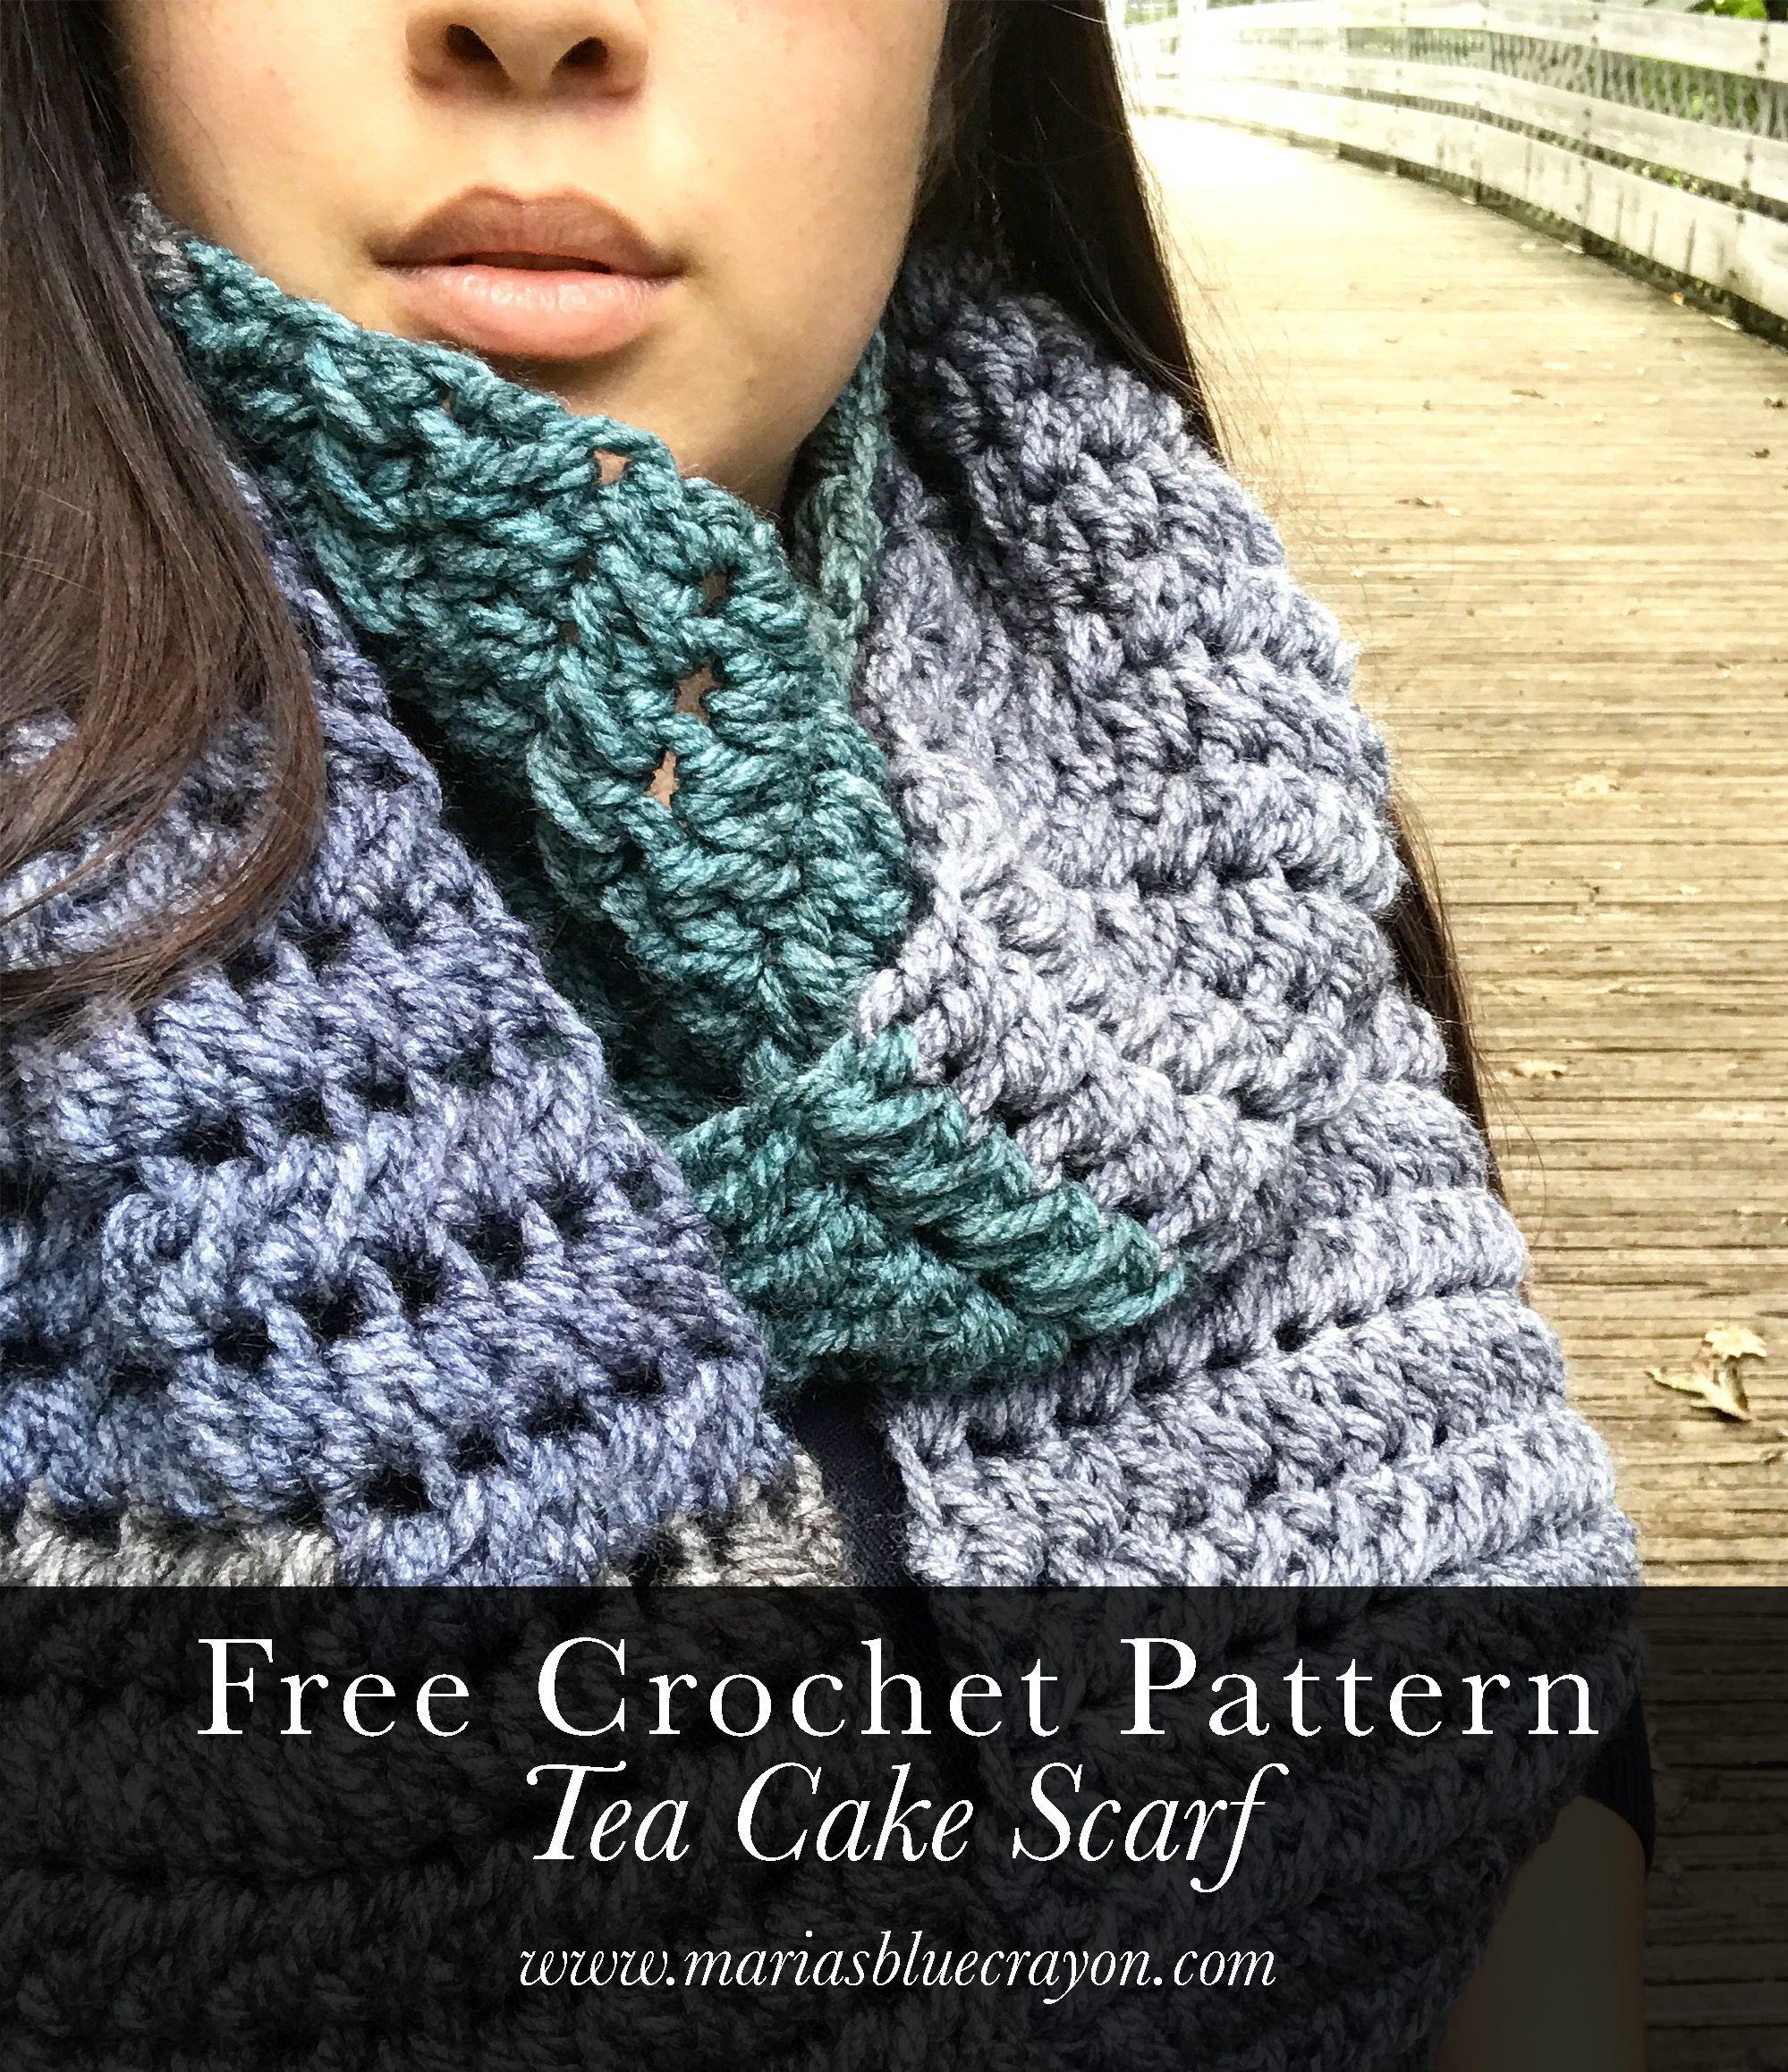 Ergonomic aluminum crochet hook by loops threads granny tea cake scarf free crochet pattern caron tea cakes marias blue crayon bankloansurffo Gallery